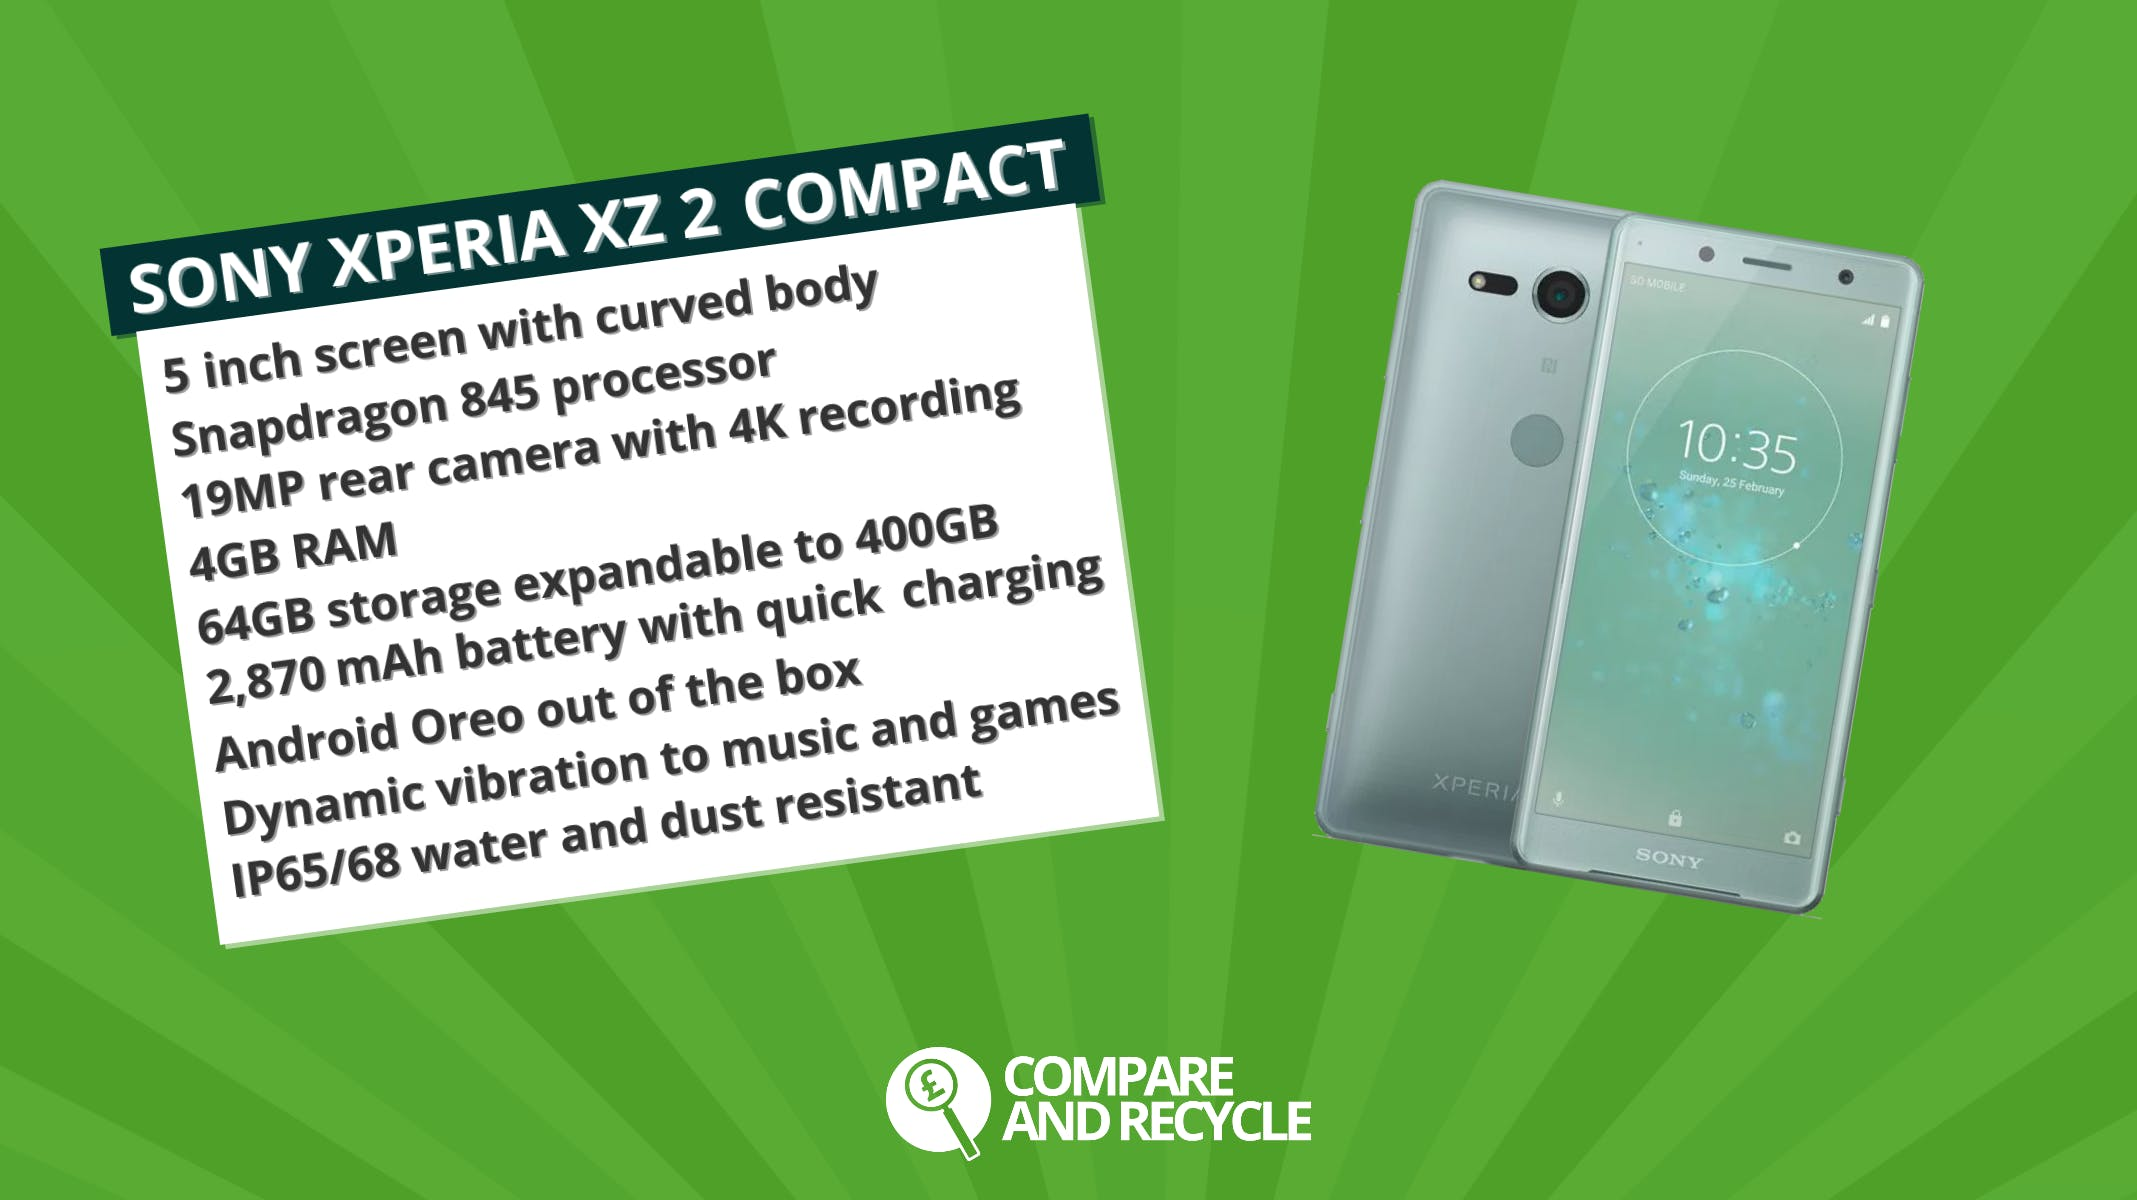 Sony-Xperia-Xz2-Compactspecsheet